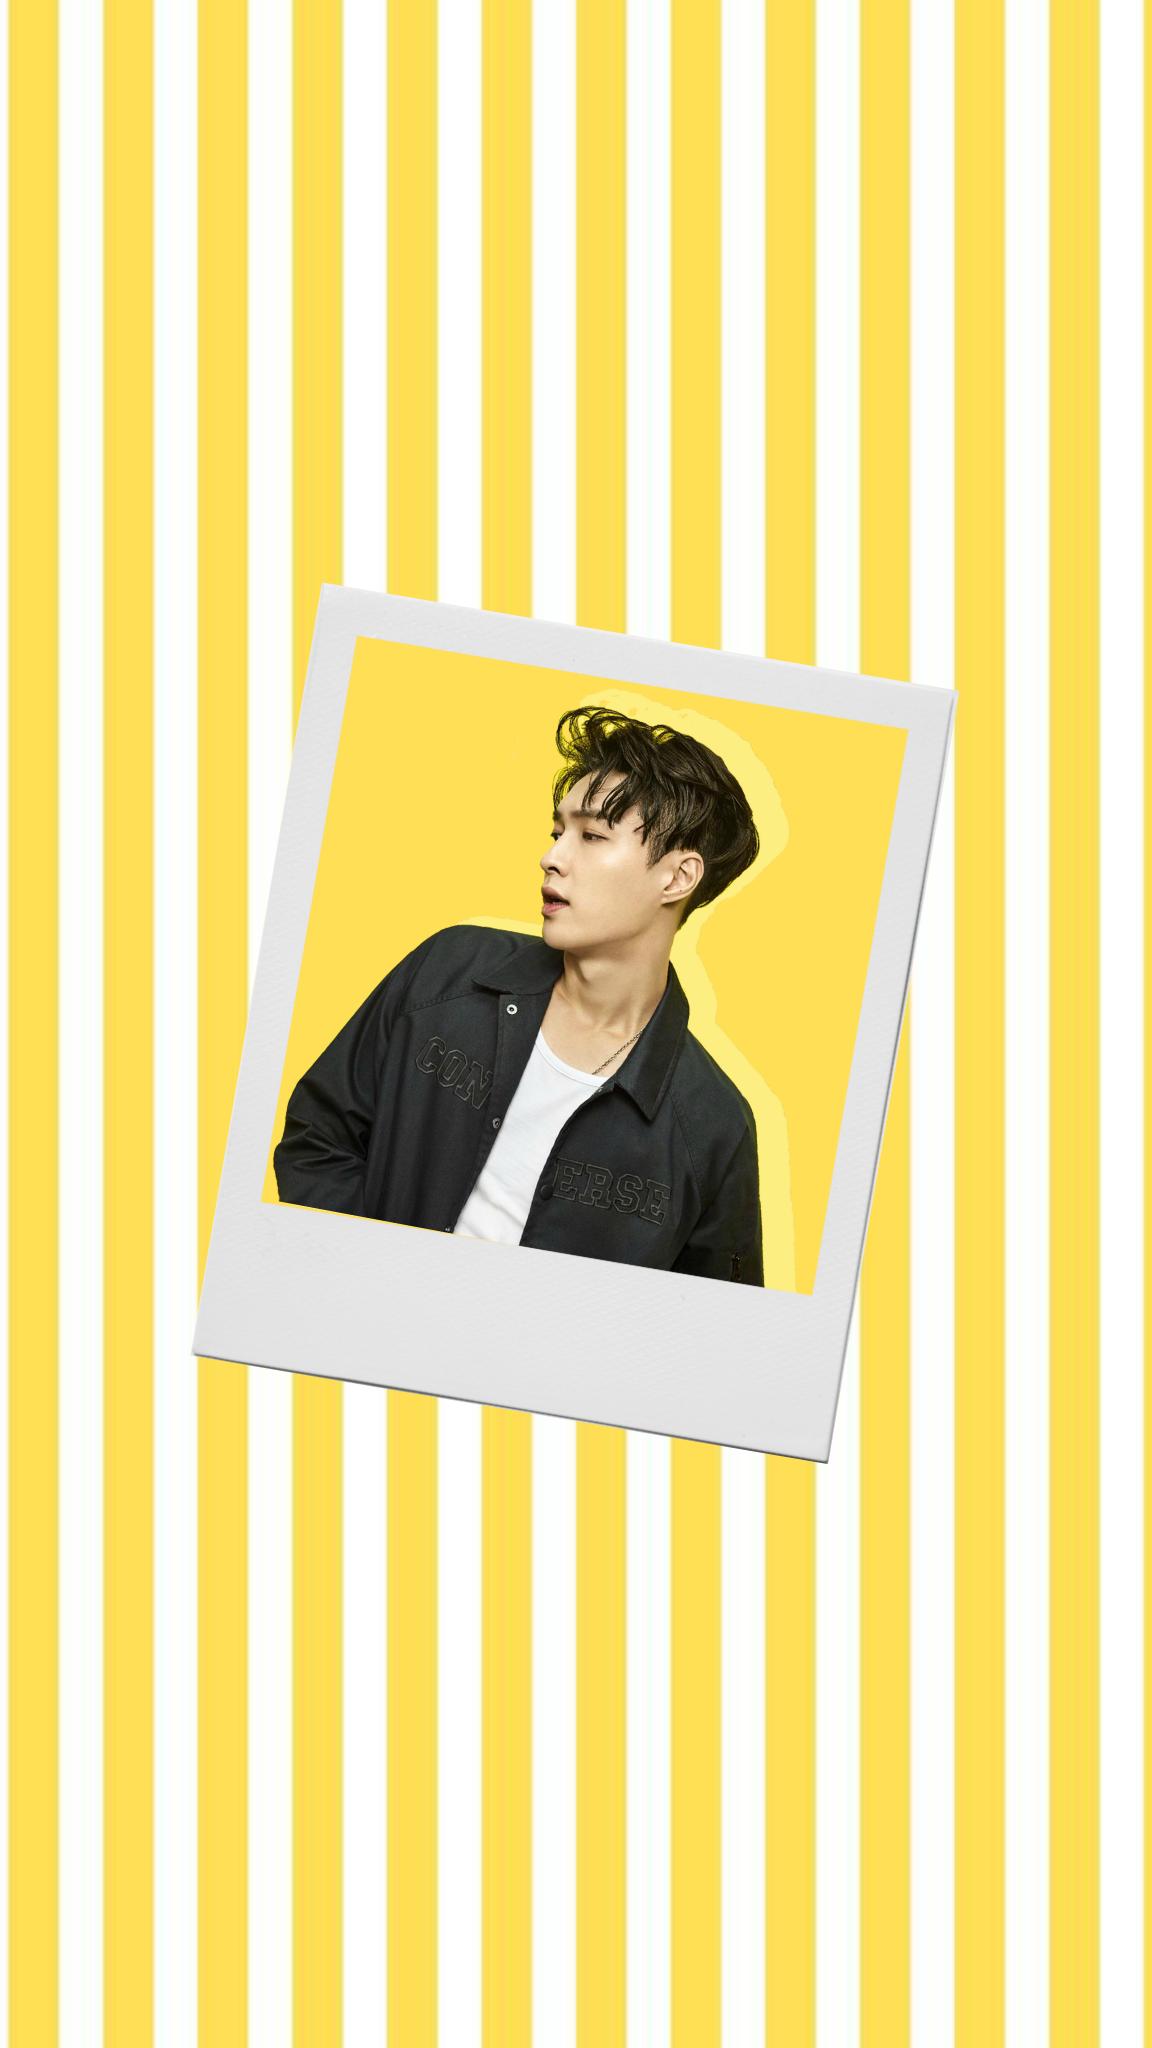 exo yixing polaroid wallpaper yellow